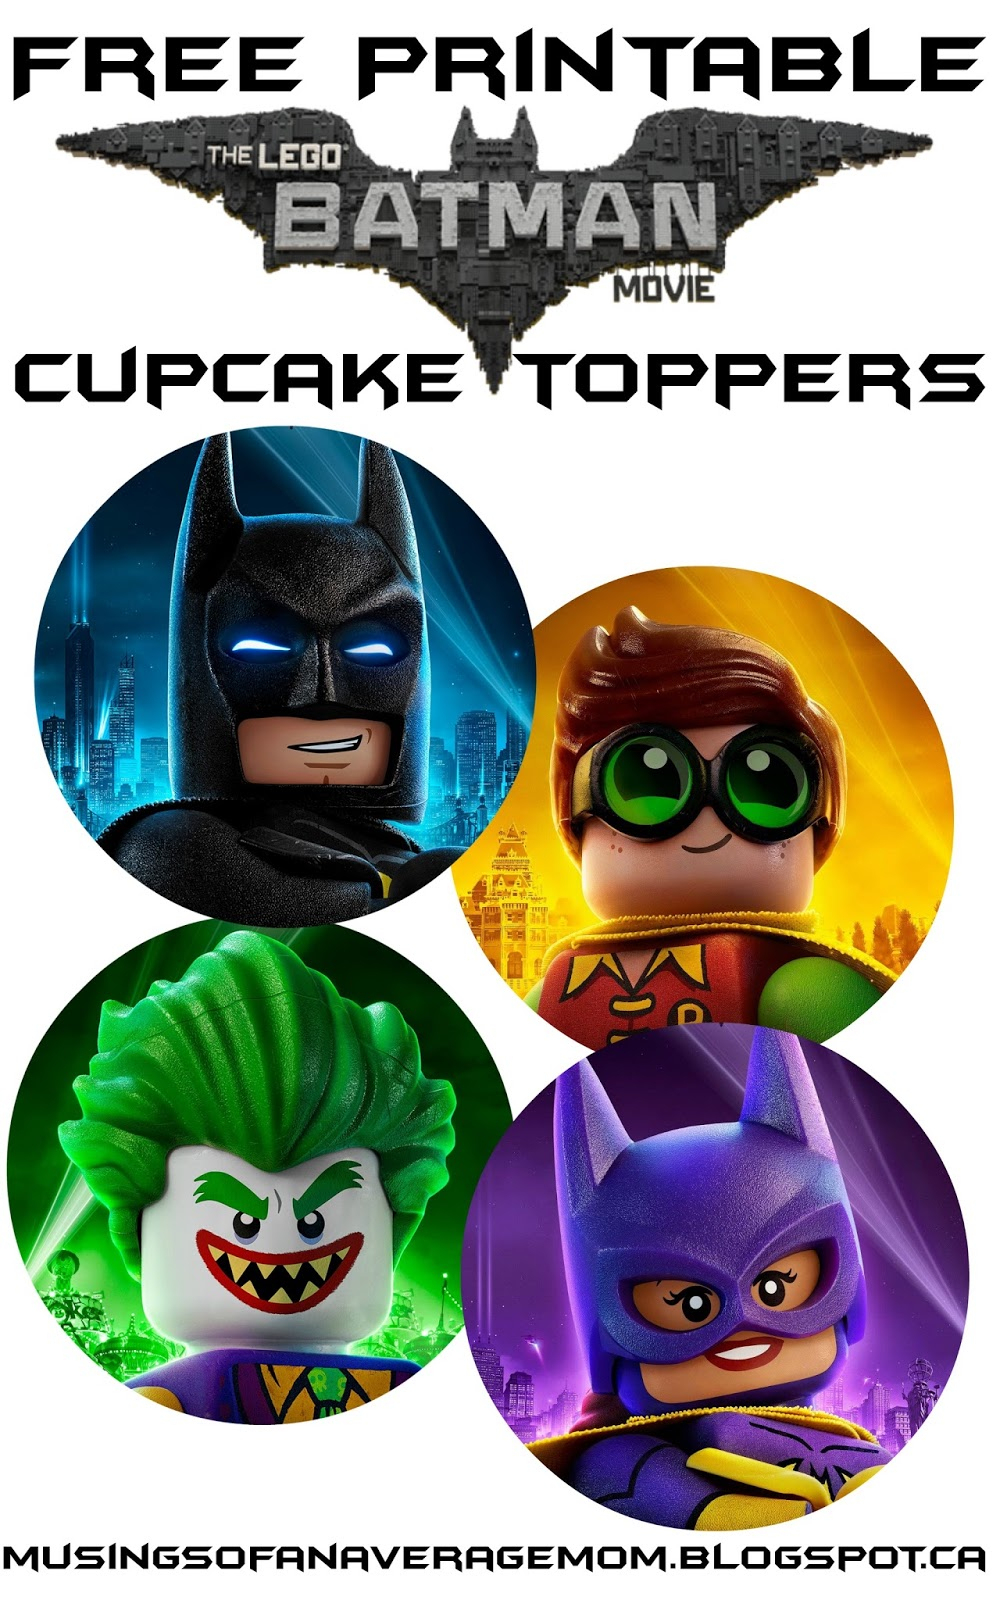 Musings Of An Average Mom: Free Lego Batman Cupcake Toppers - Batman Cupcake Toppers Free Printable